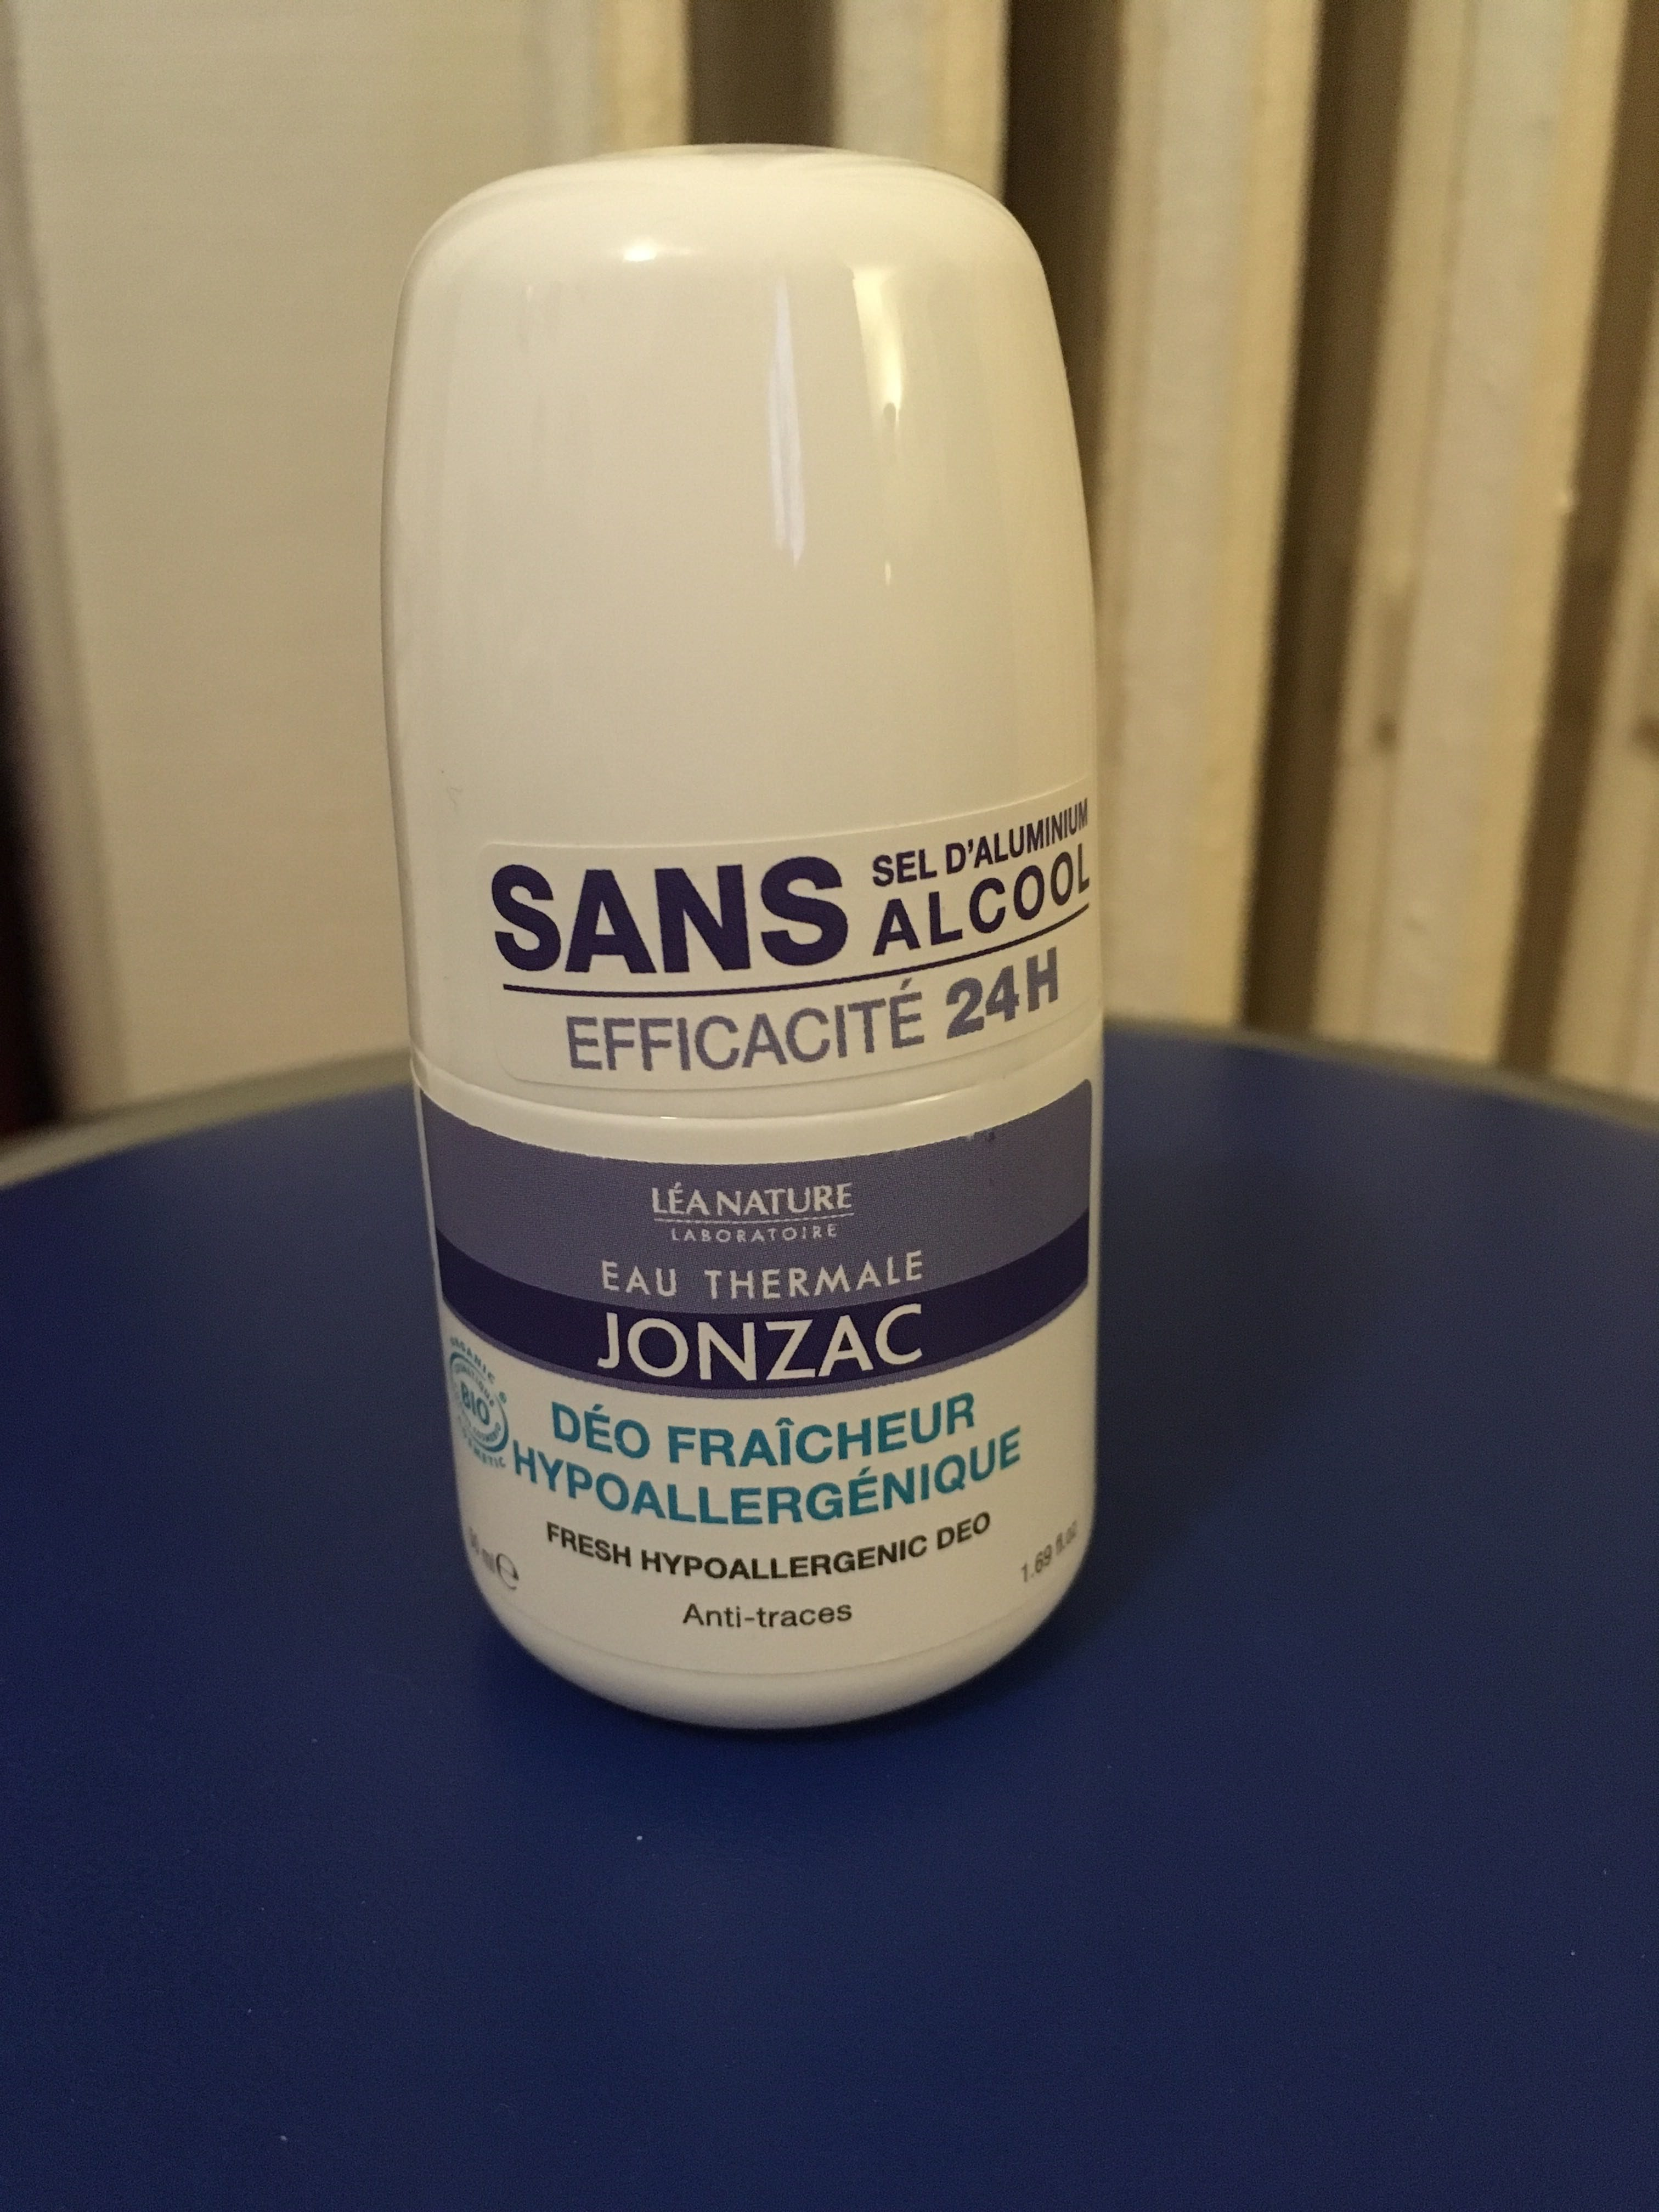 Déo eau thermale Jonzac - Product - fr